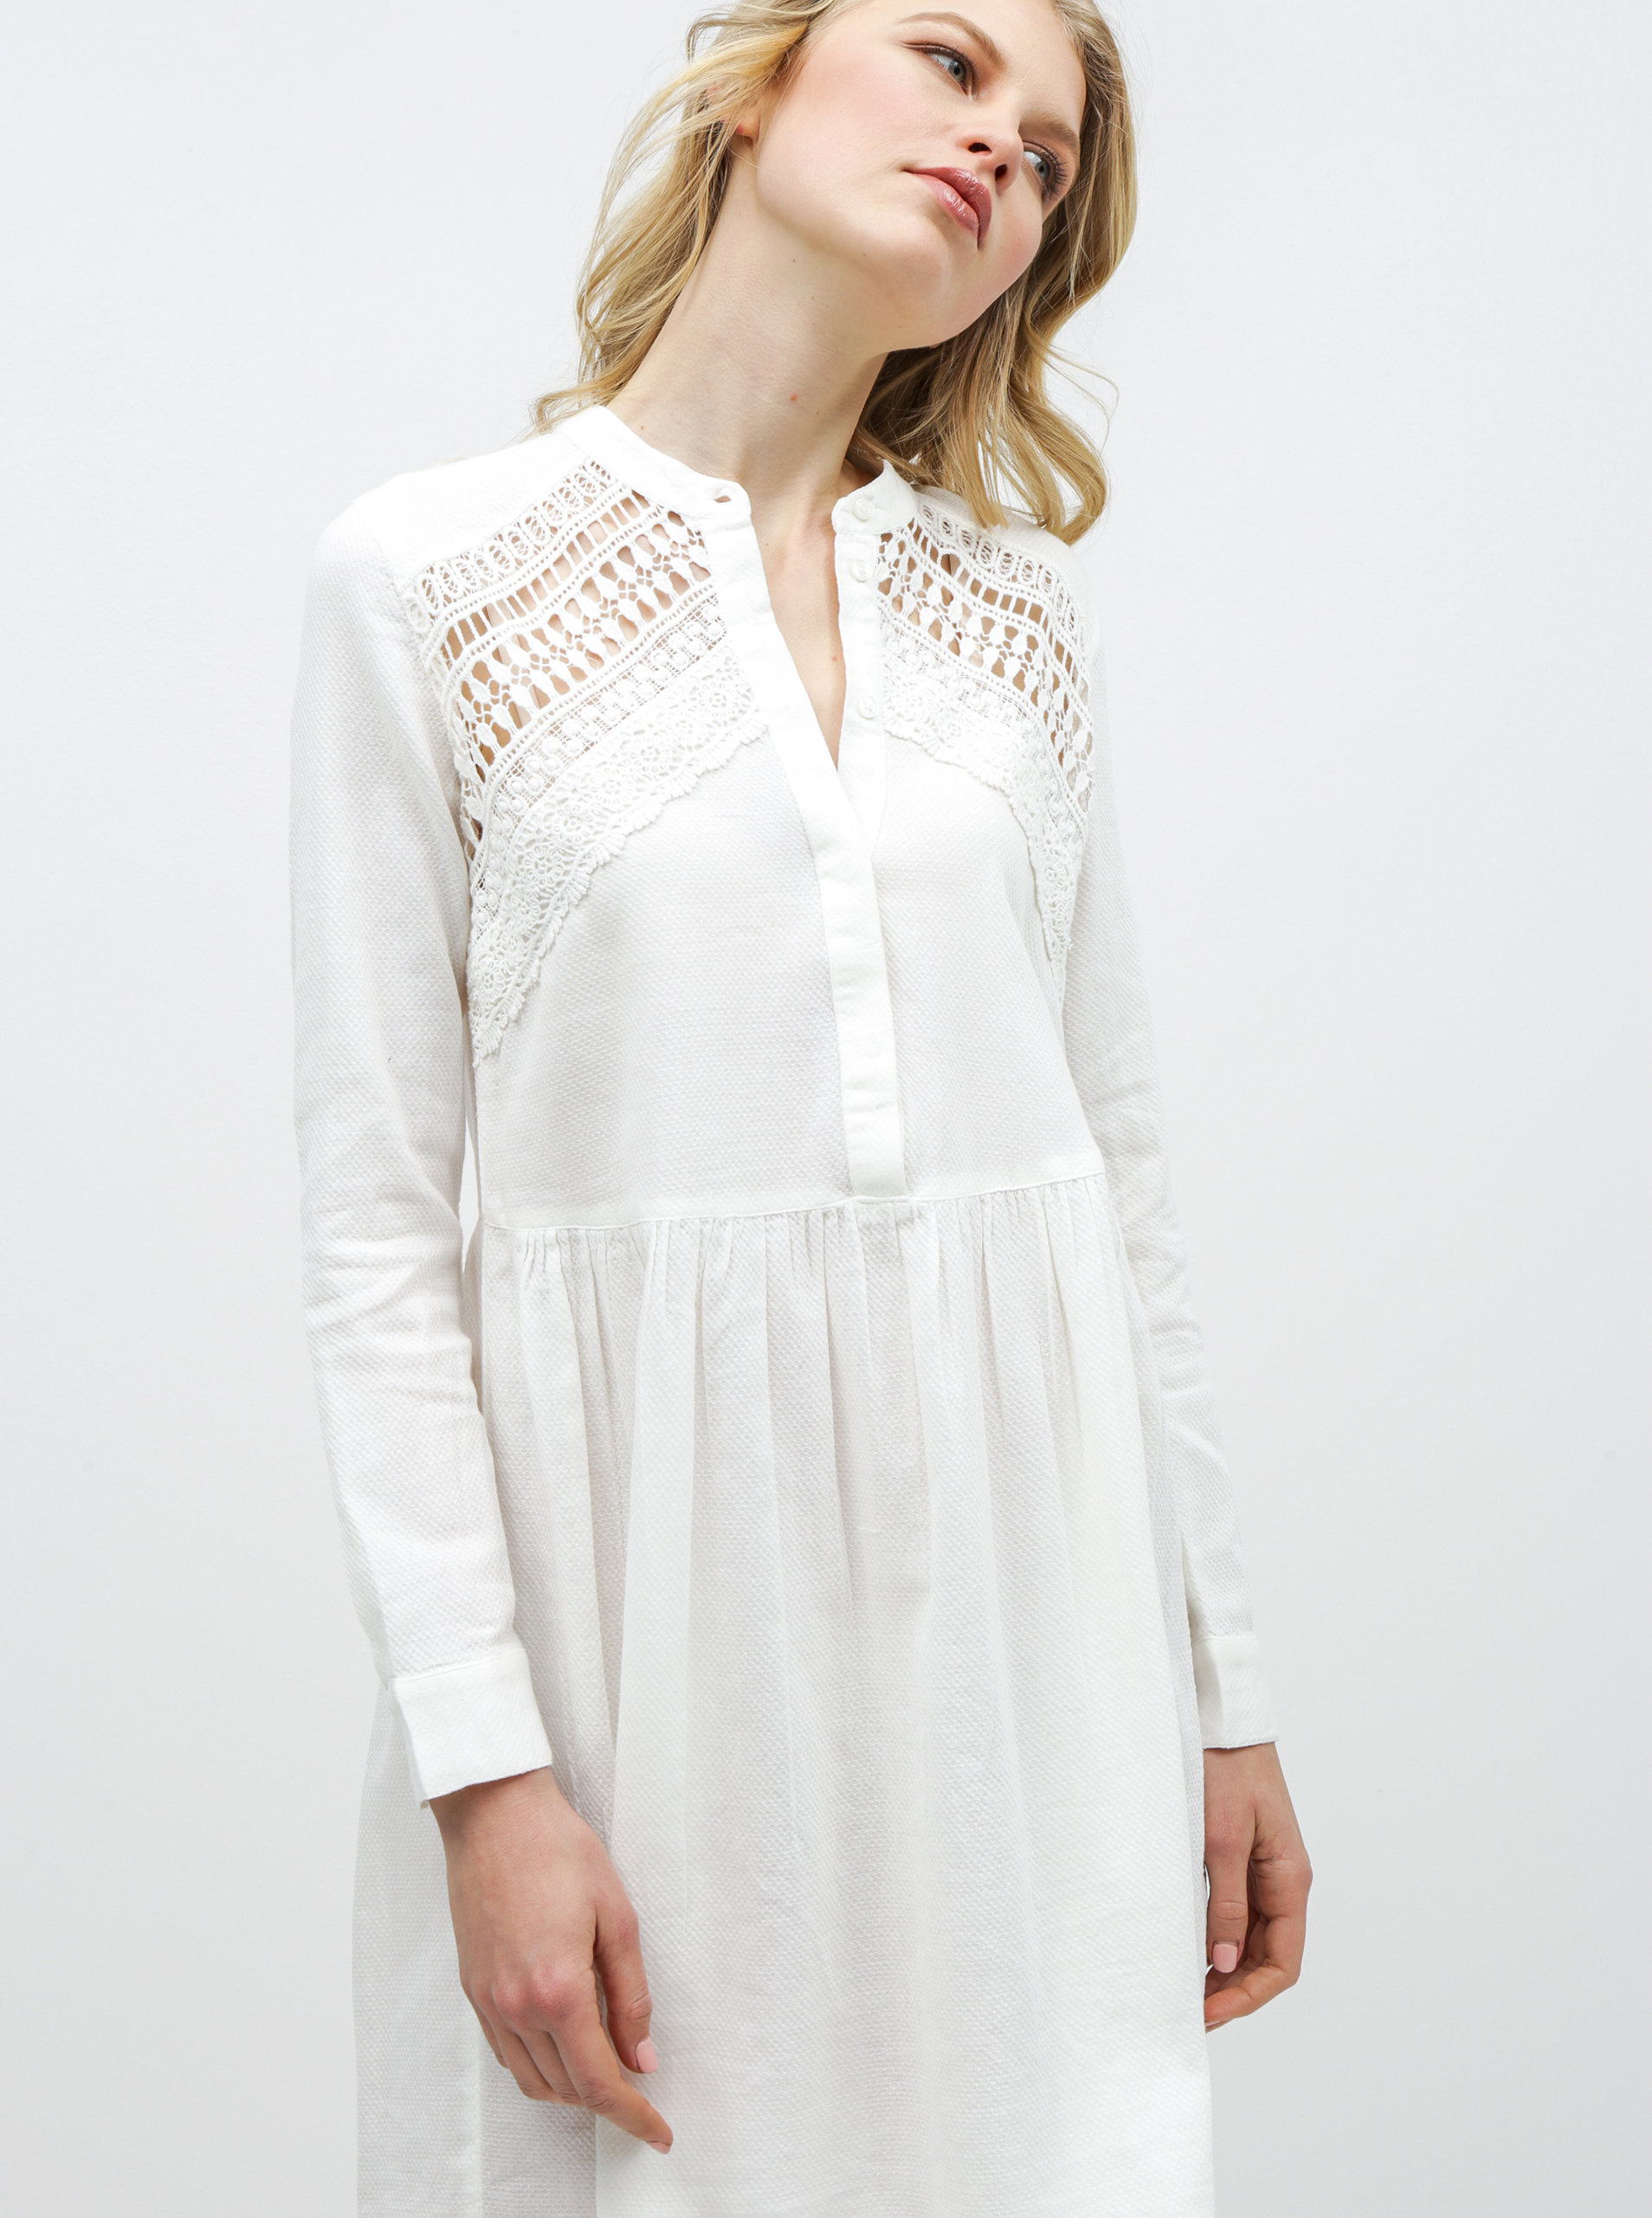 e59f8c95d9b2 Bílé šaty s krajkou Noisy May Arge ...